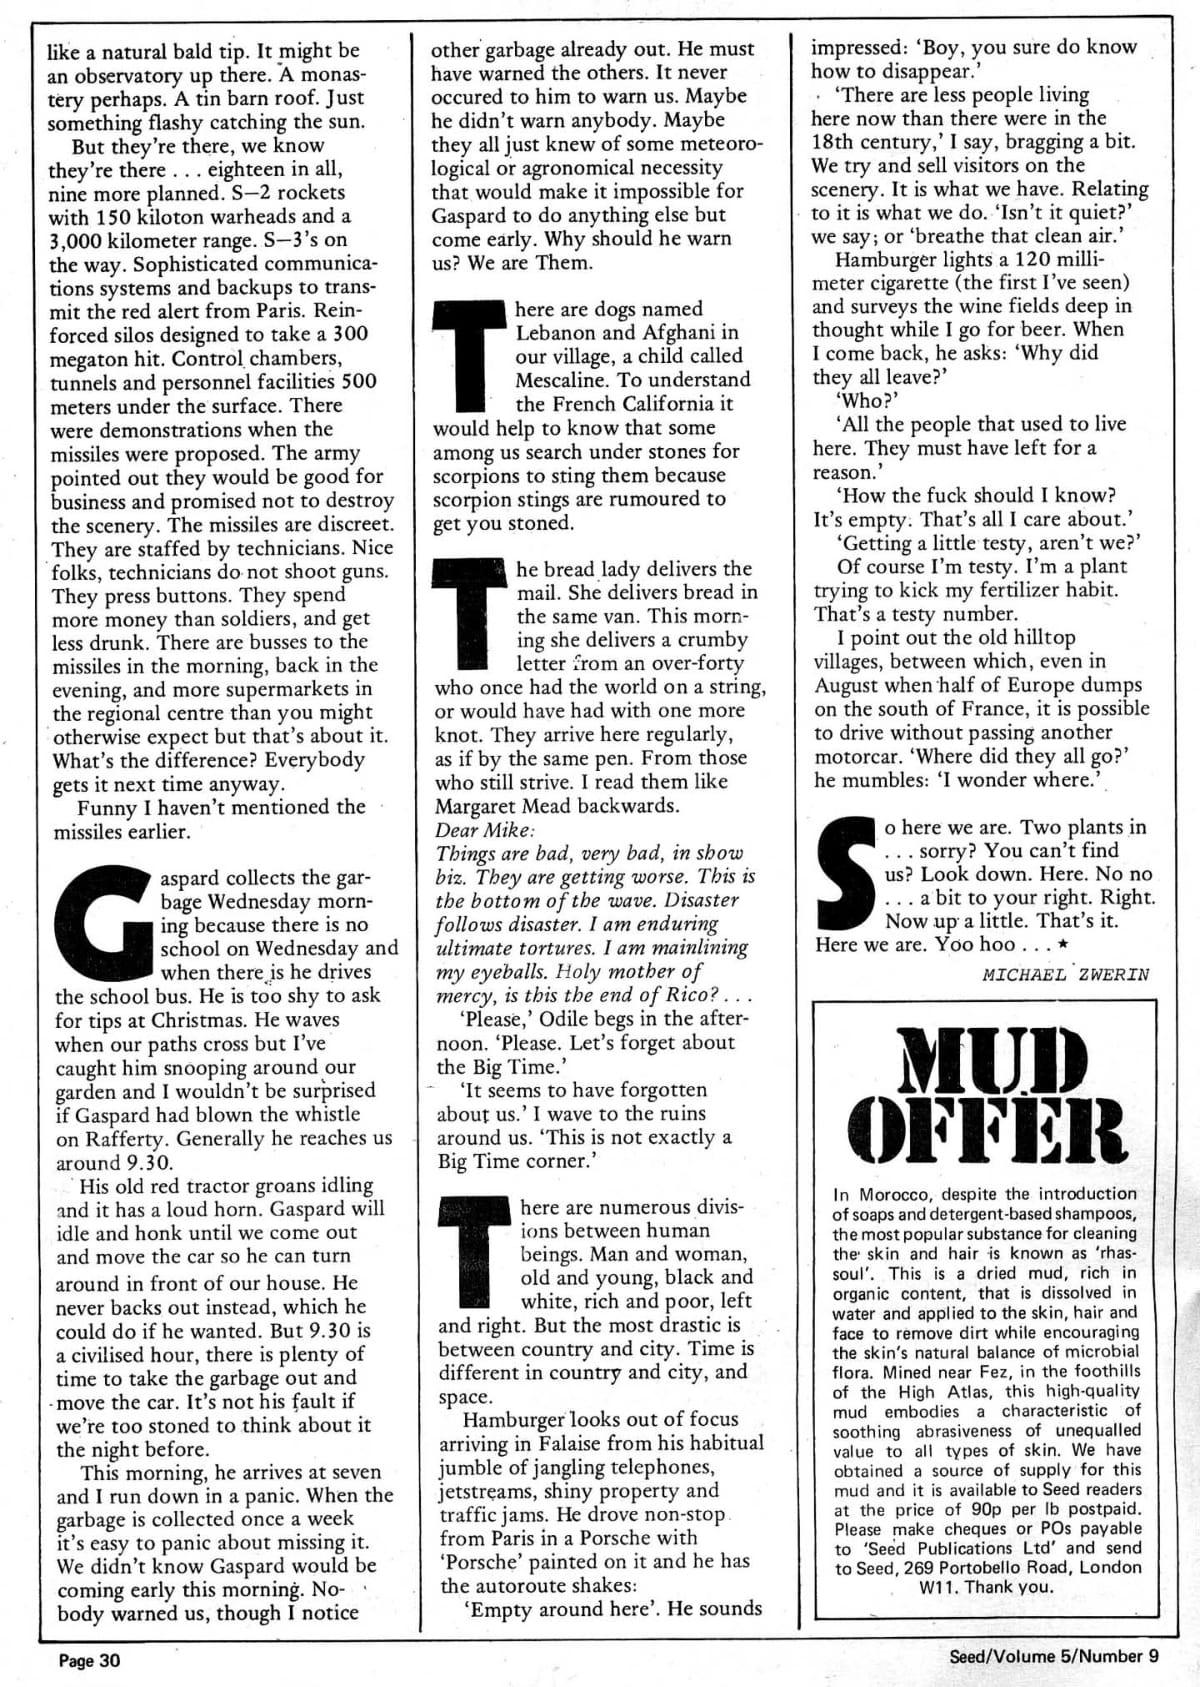 Seed Vol 5 No 9 September 1976 p 32 — Craig Sams